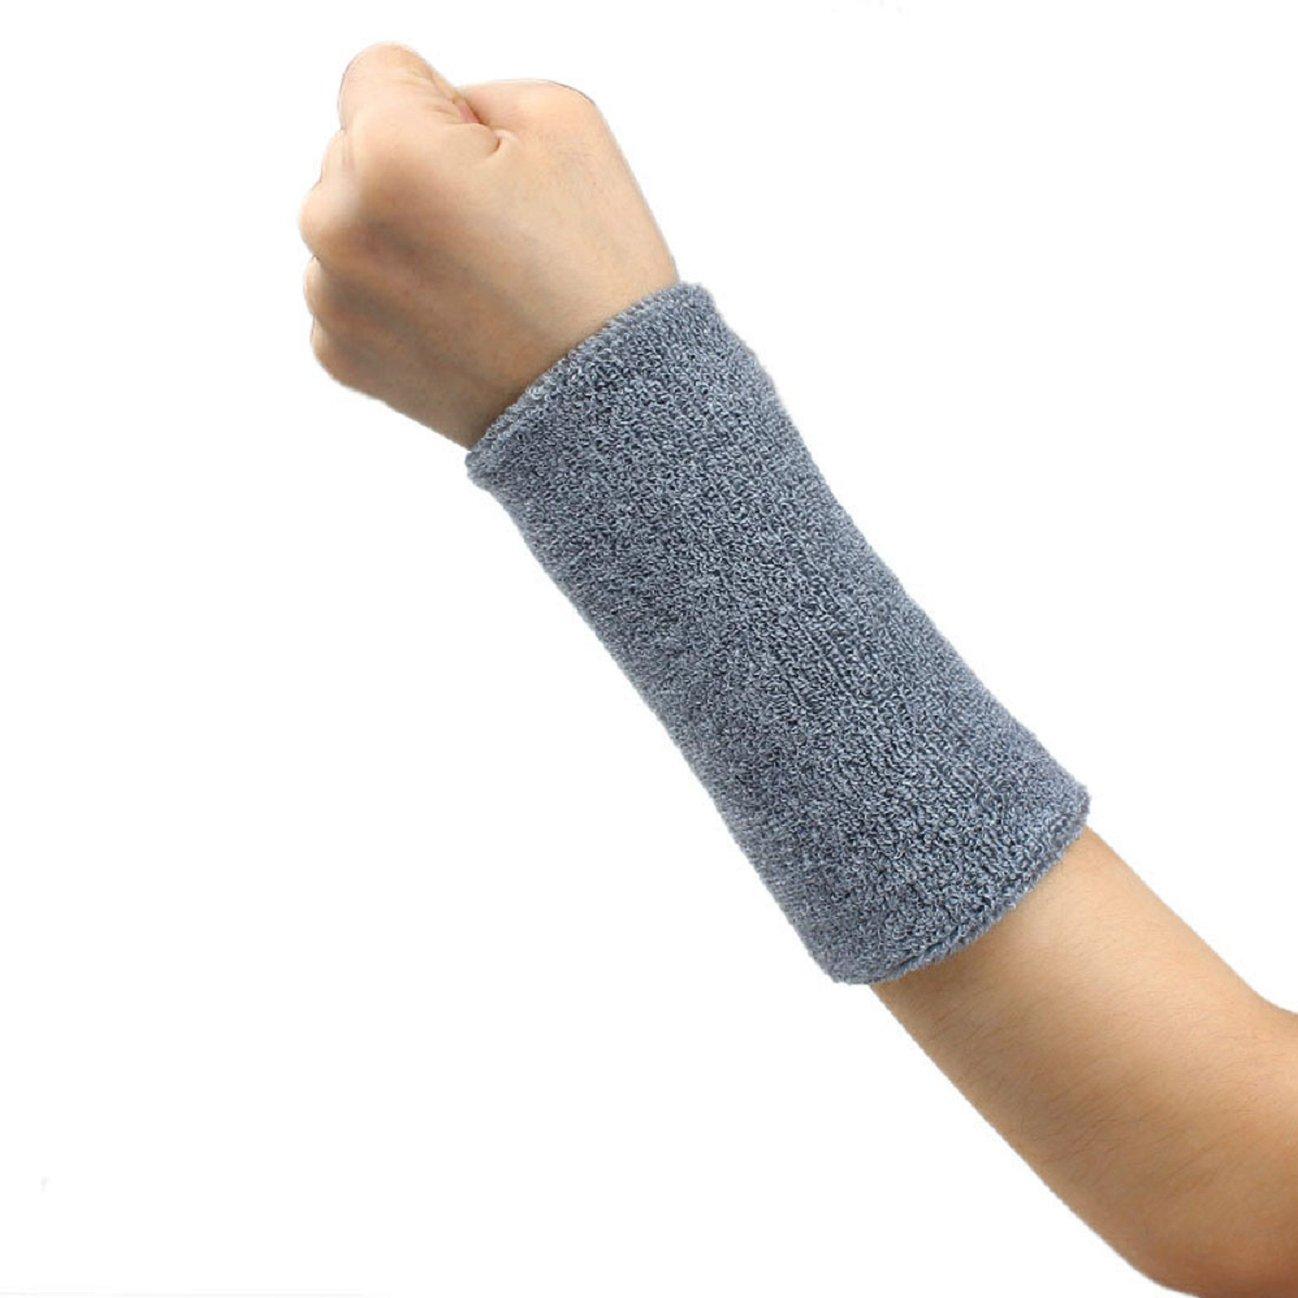 Tonsee 1 PCS Unisex Cotton Basketball Tennis Gym Yoga Sweatband Wristband (Gray)